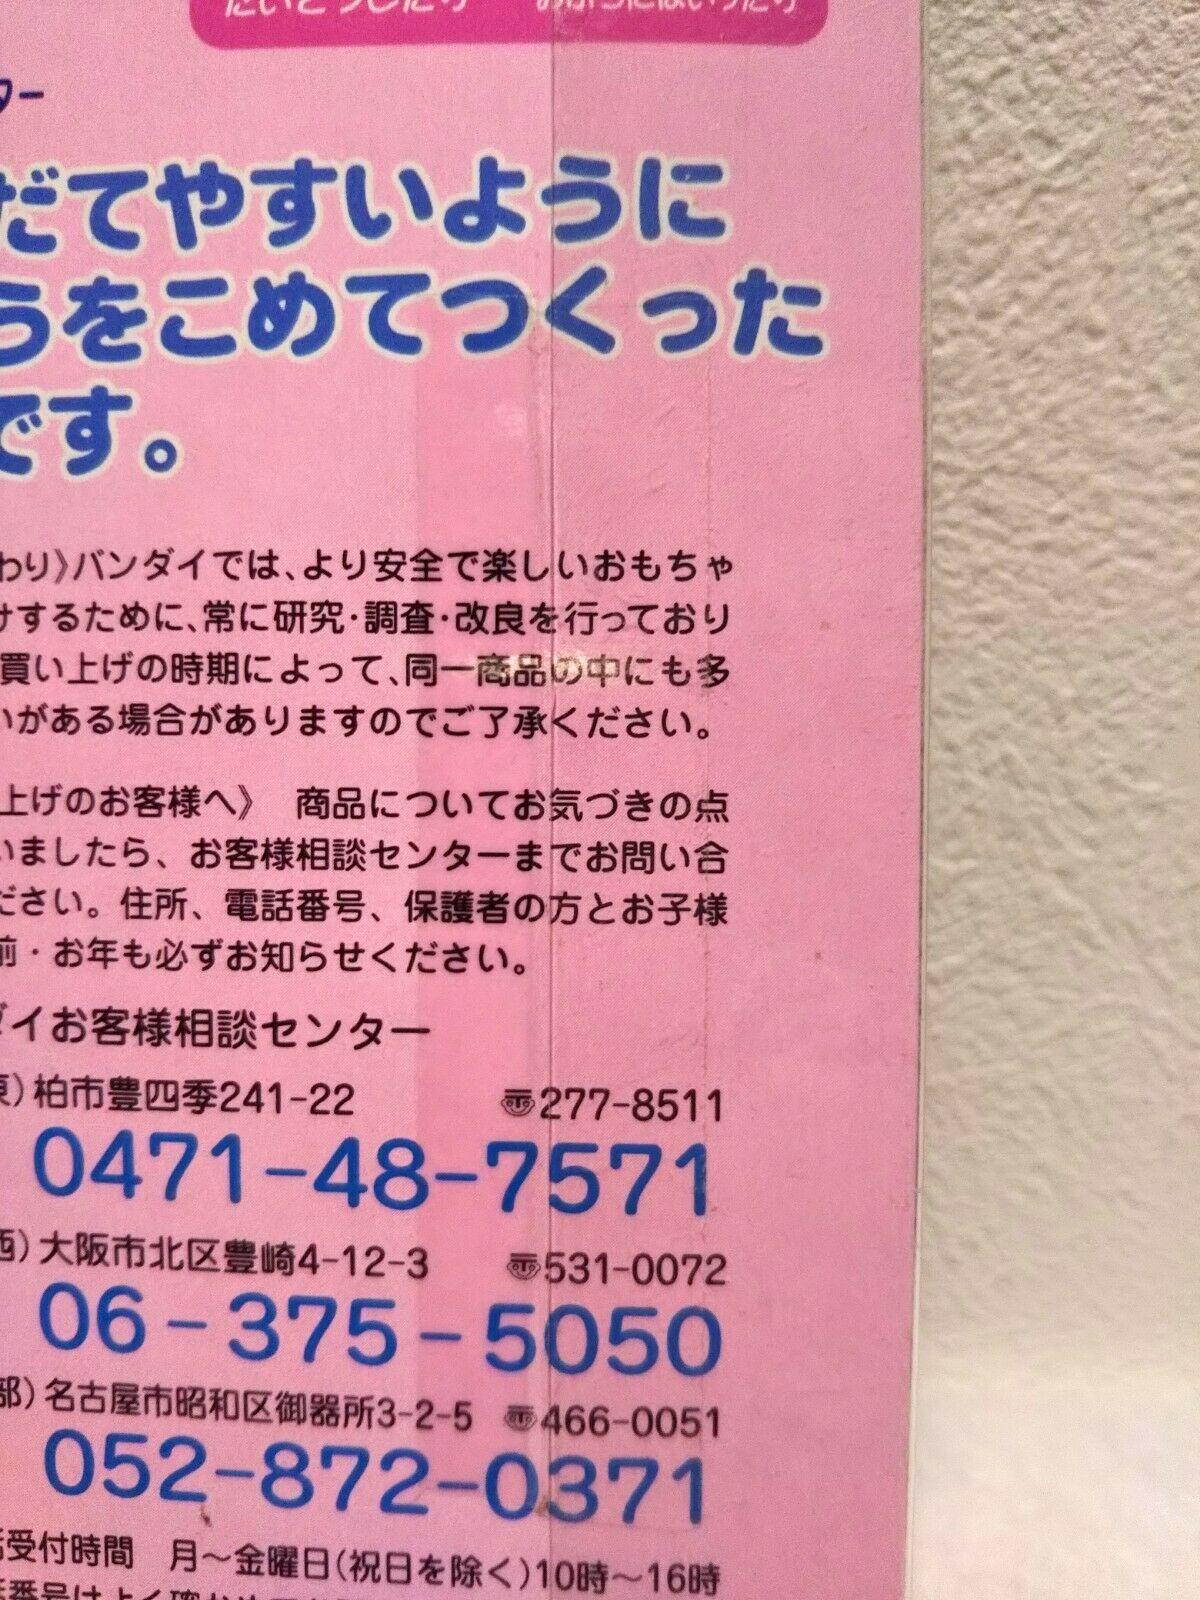 Yasashii Tamagotchi Blue Bandai 1998 Japan Brand NEW Unused perfect condition